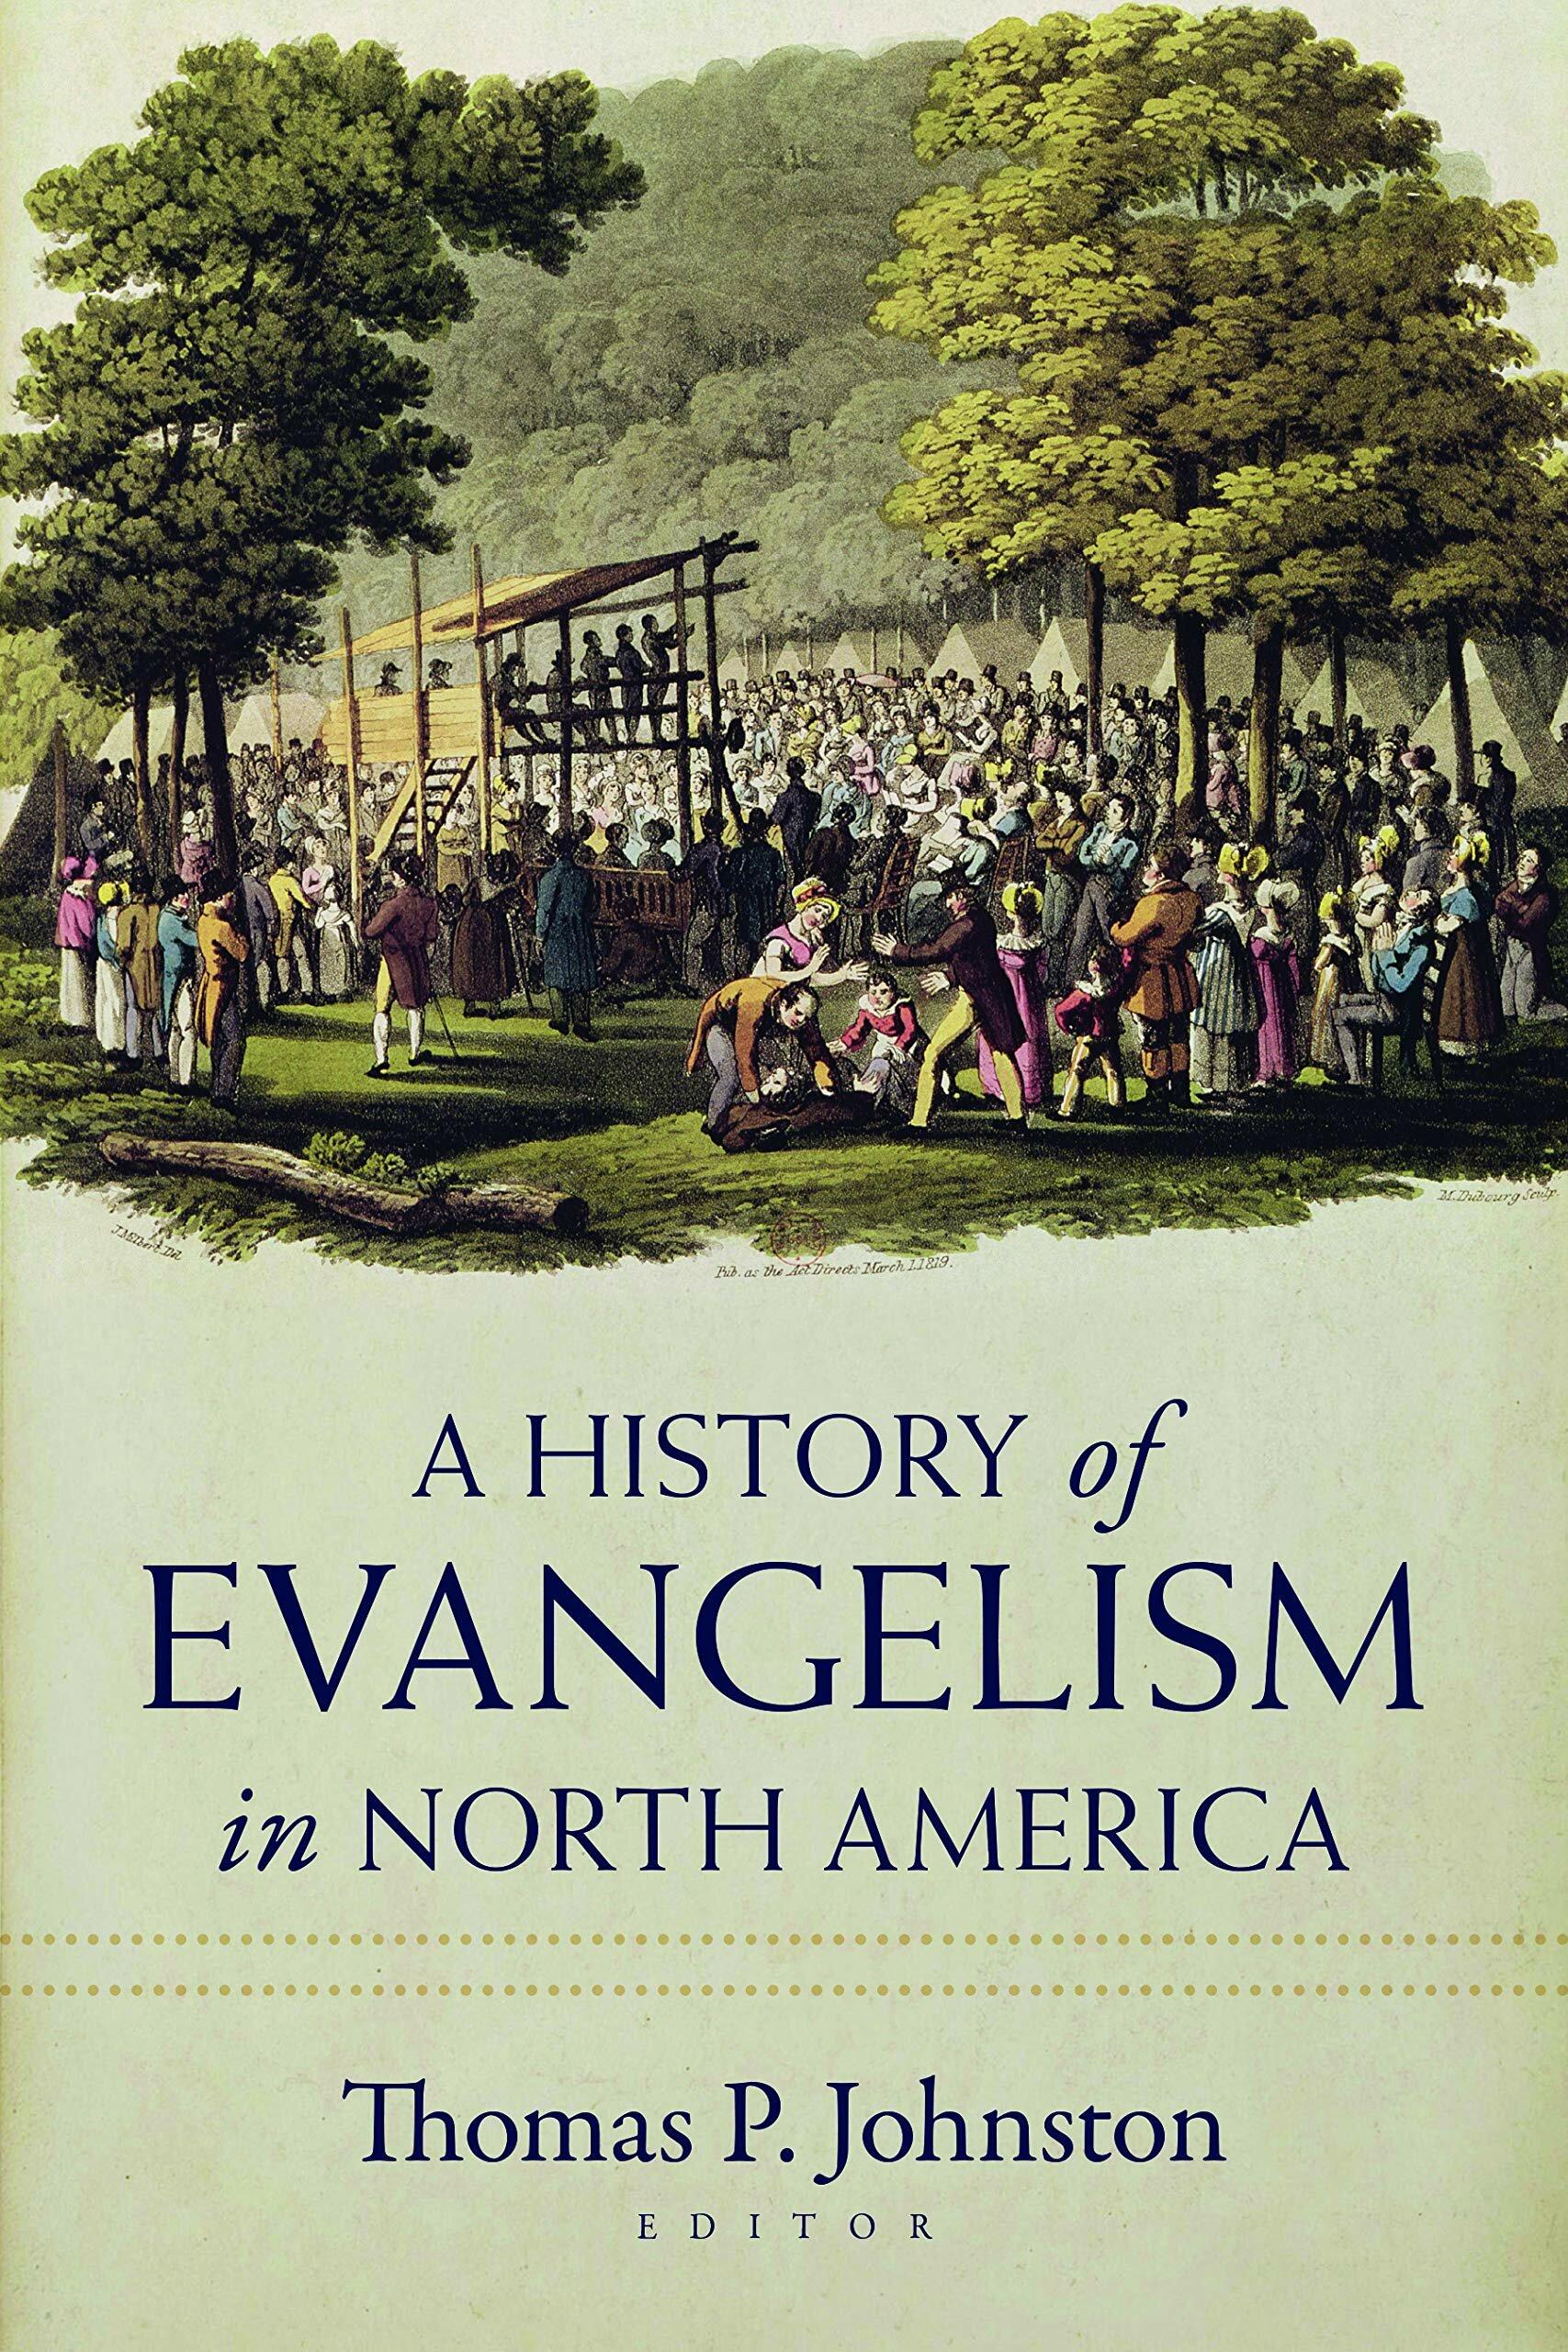 The History of Evangelism in North America